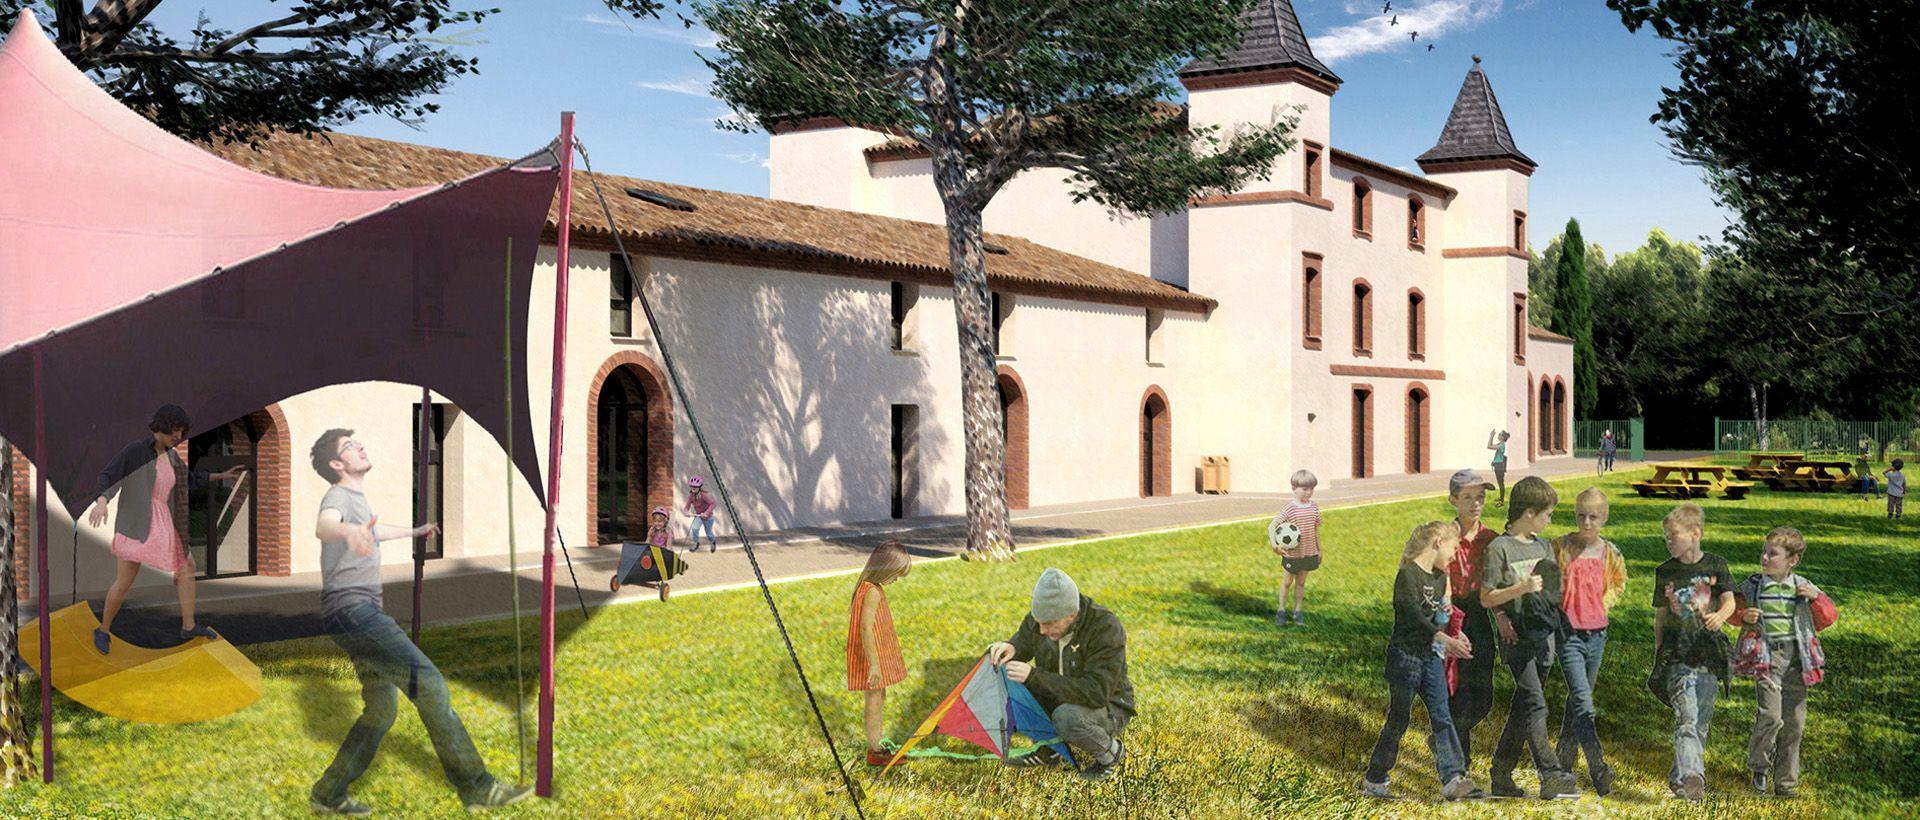 Seuil-architecture-rehabilitation-chateau-Mounede-slid1